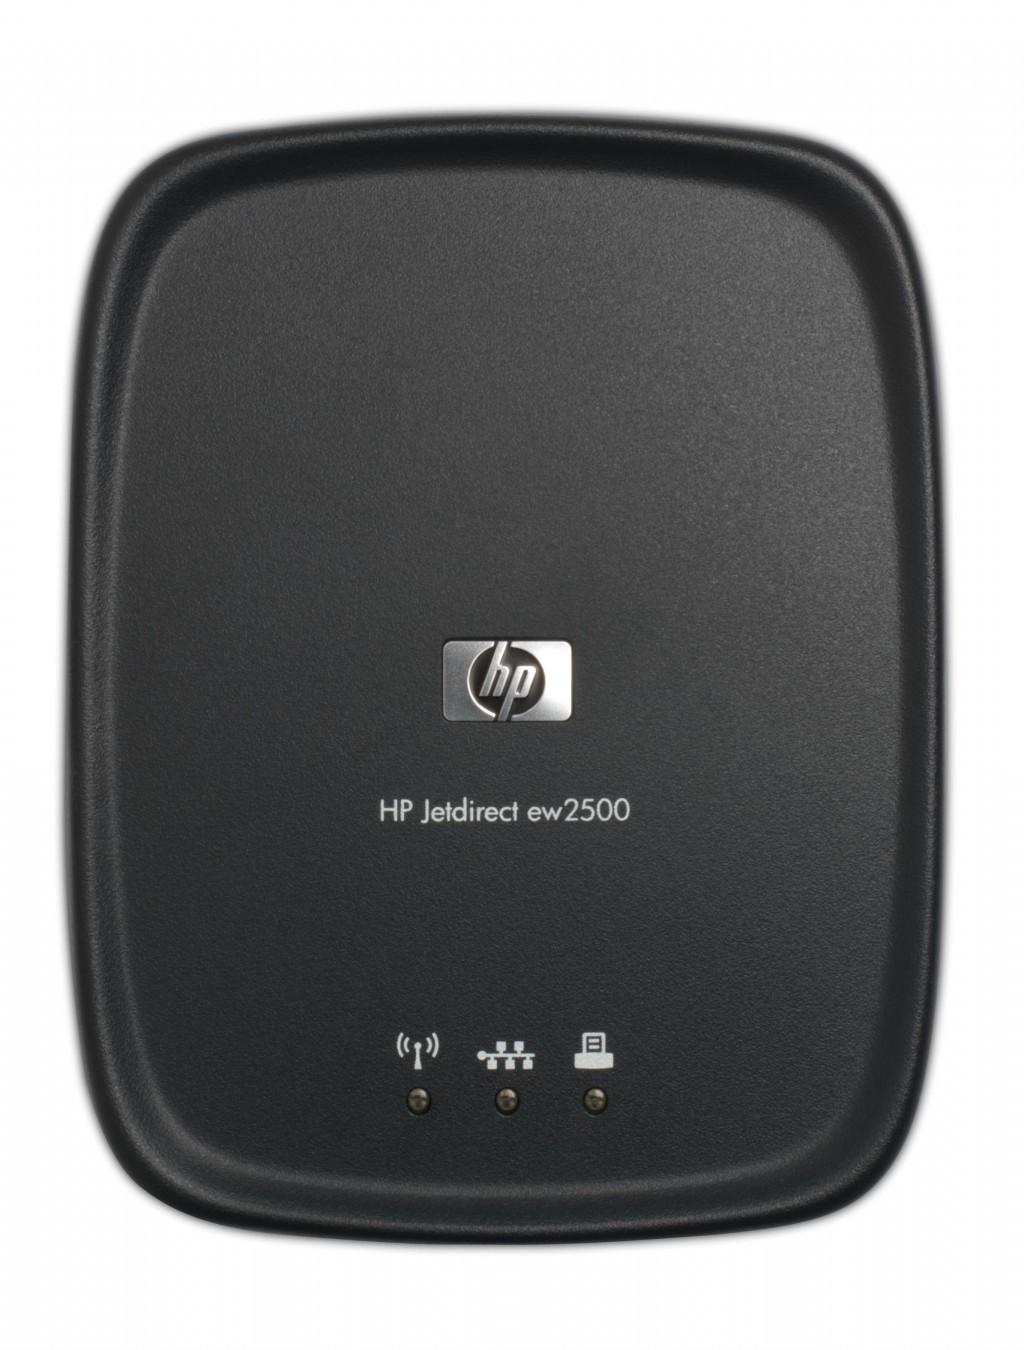 HP Jetdirect ew2500 802.11b/g (J8021A)